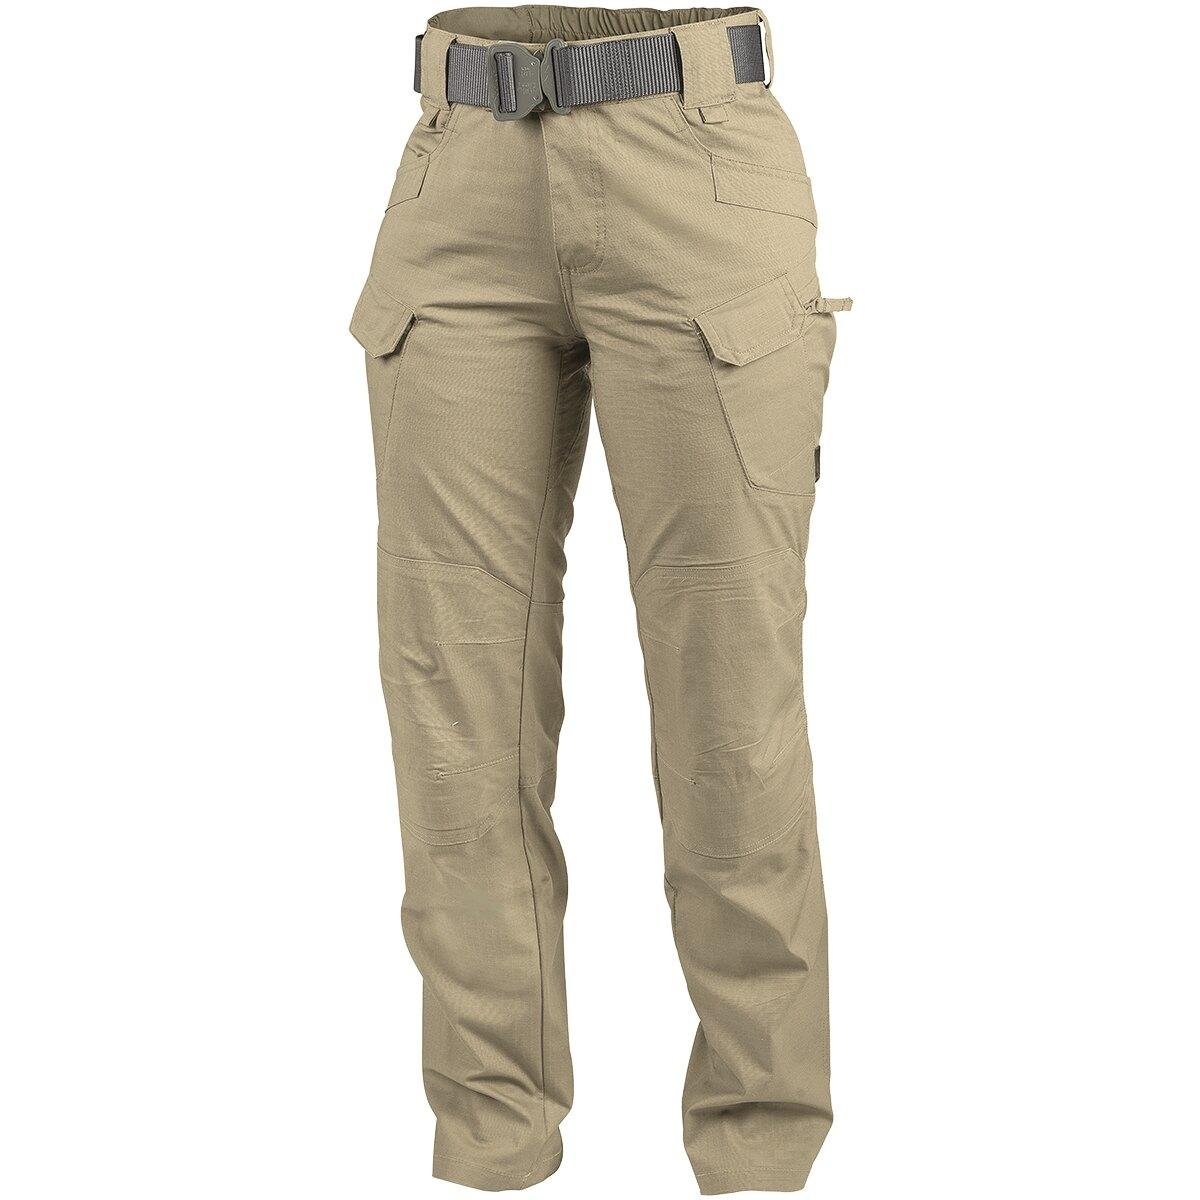 Levně Dámské kalhoty UTP® Helikon-Tex® Rip-Stop - Khaki (Barva: Khaki, Velikost: 28/32)